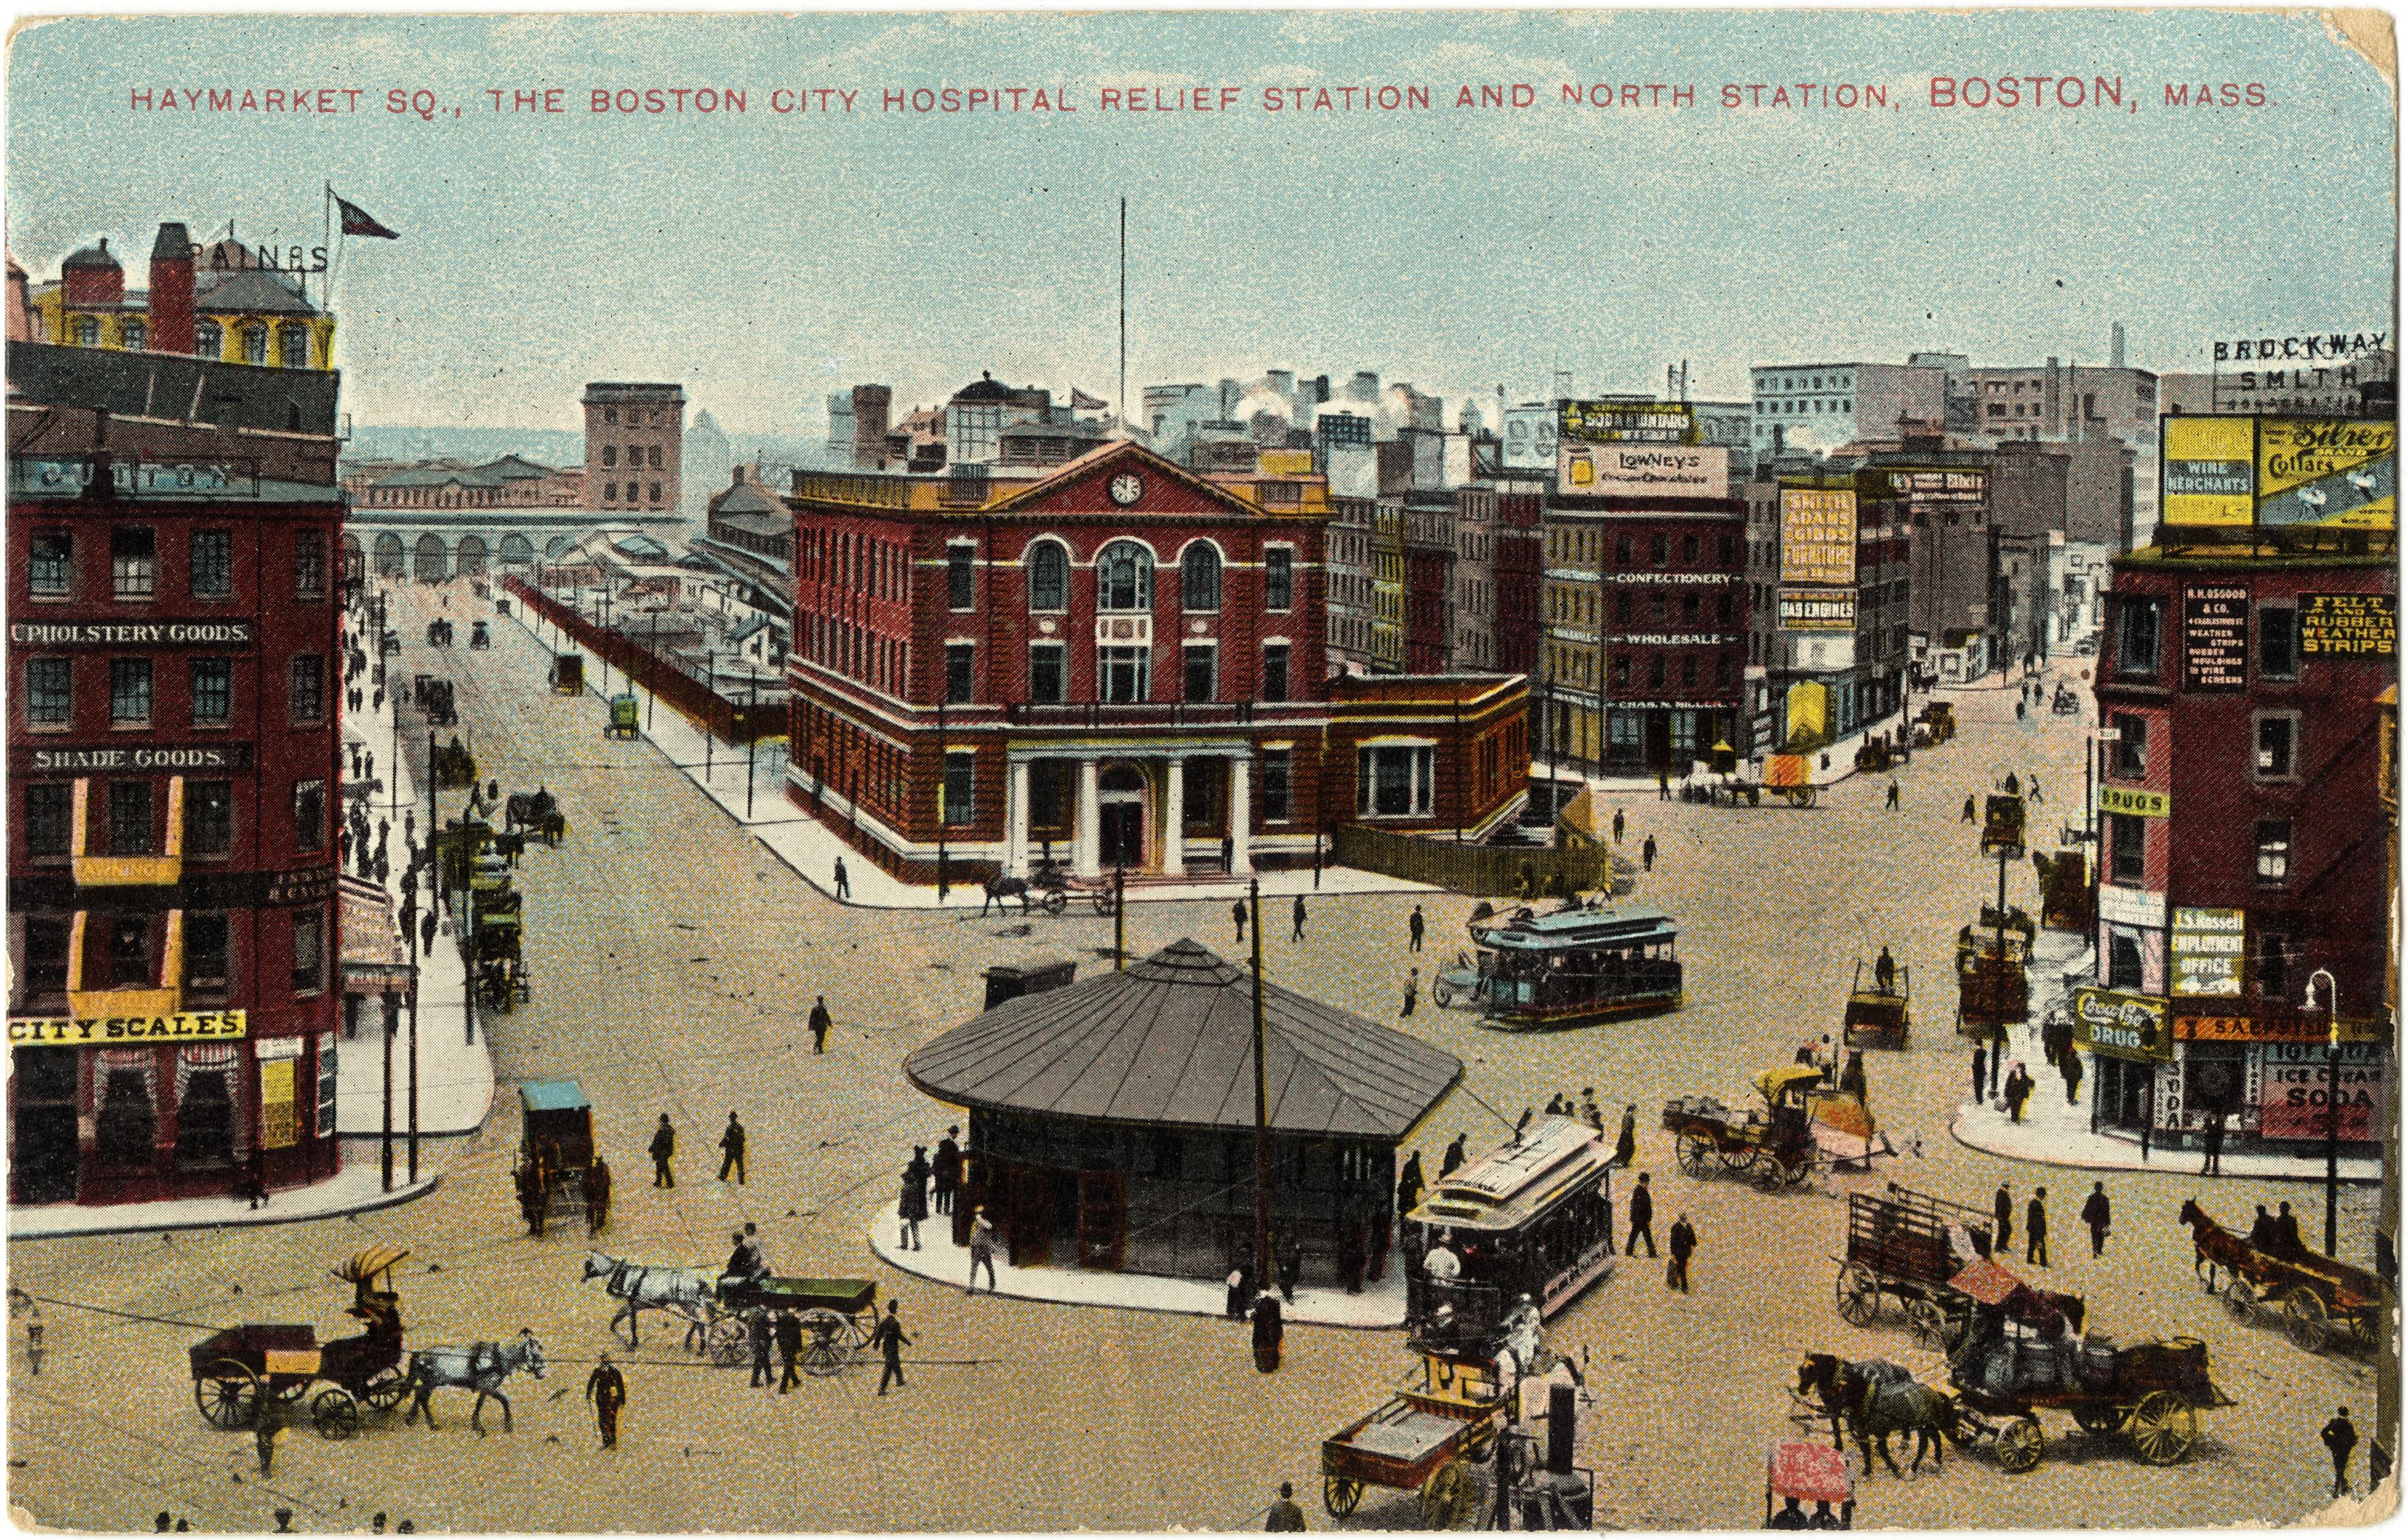 Haymarket Square In 1909 In Boston Massachusetts Image